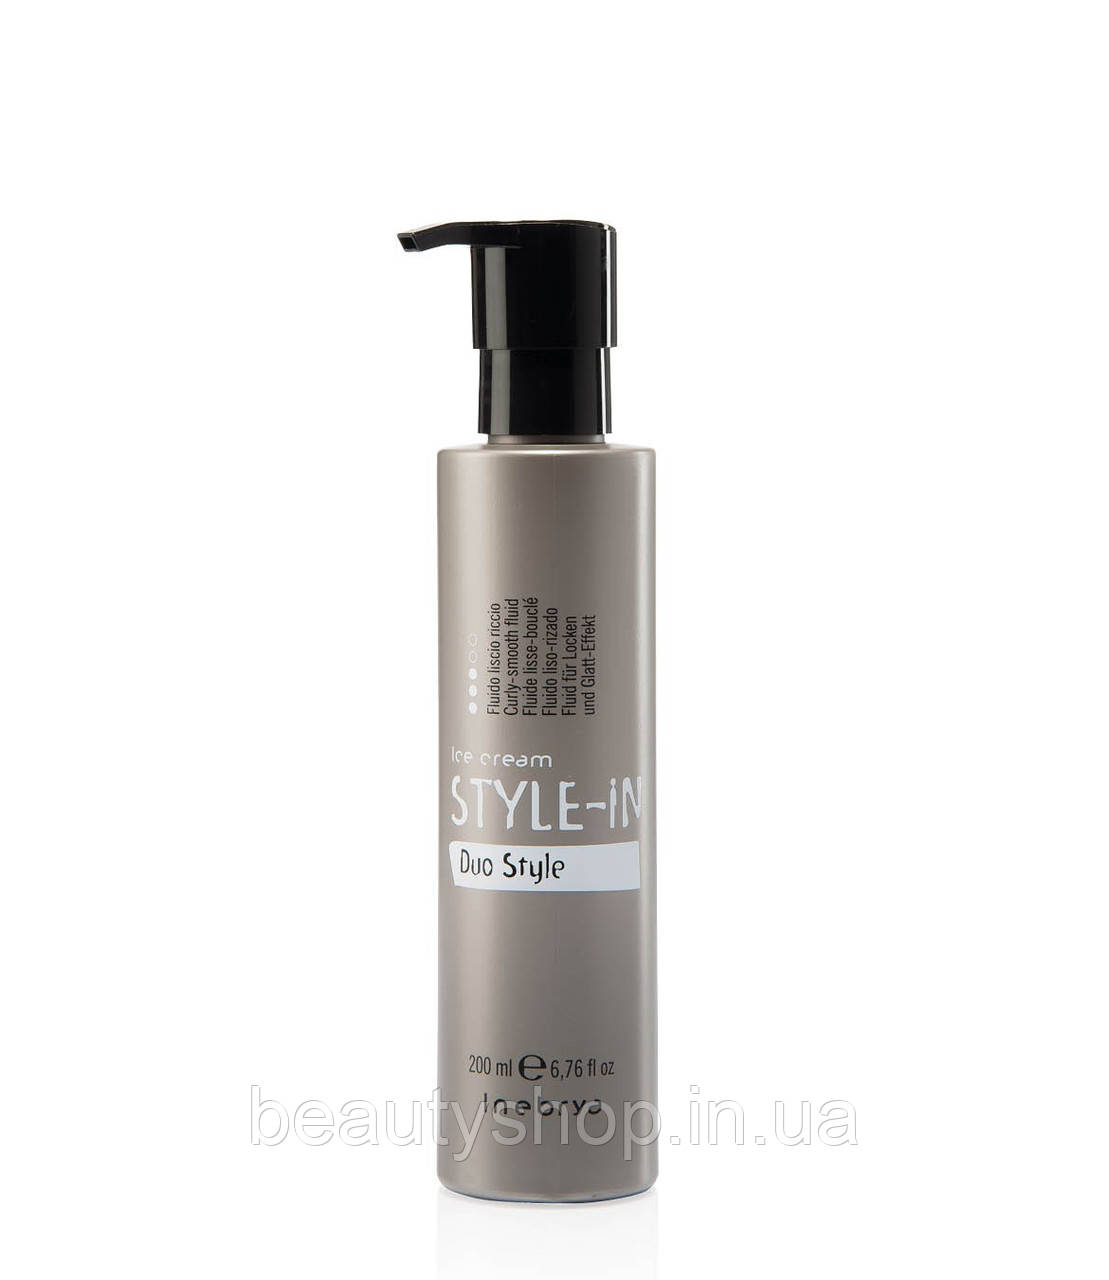 Флюид для завивки или выпрямления волос Inebrya Duo style 200ml.